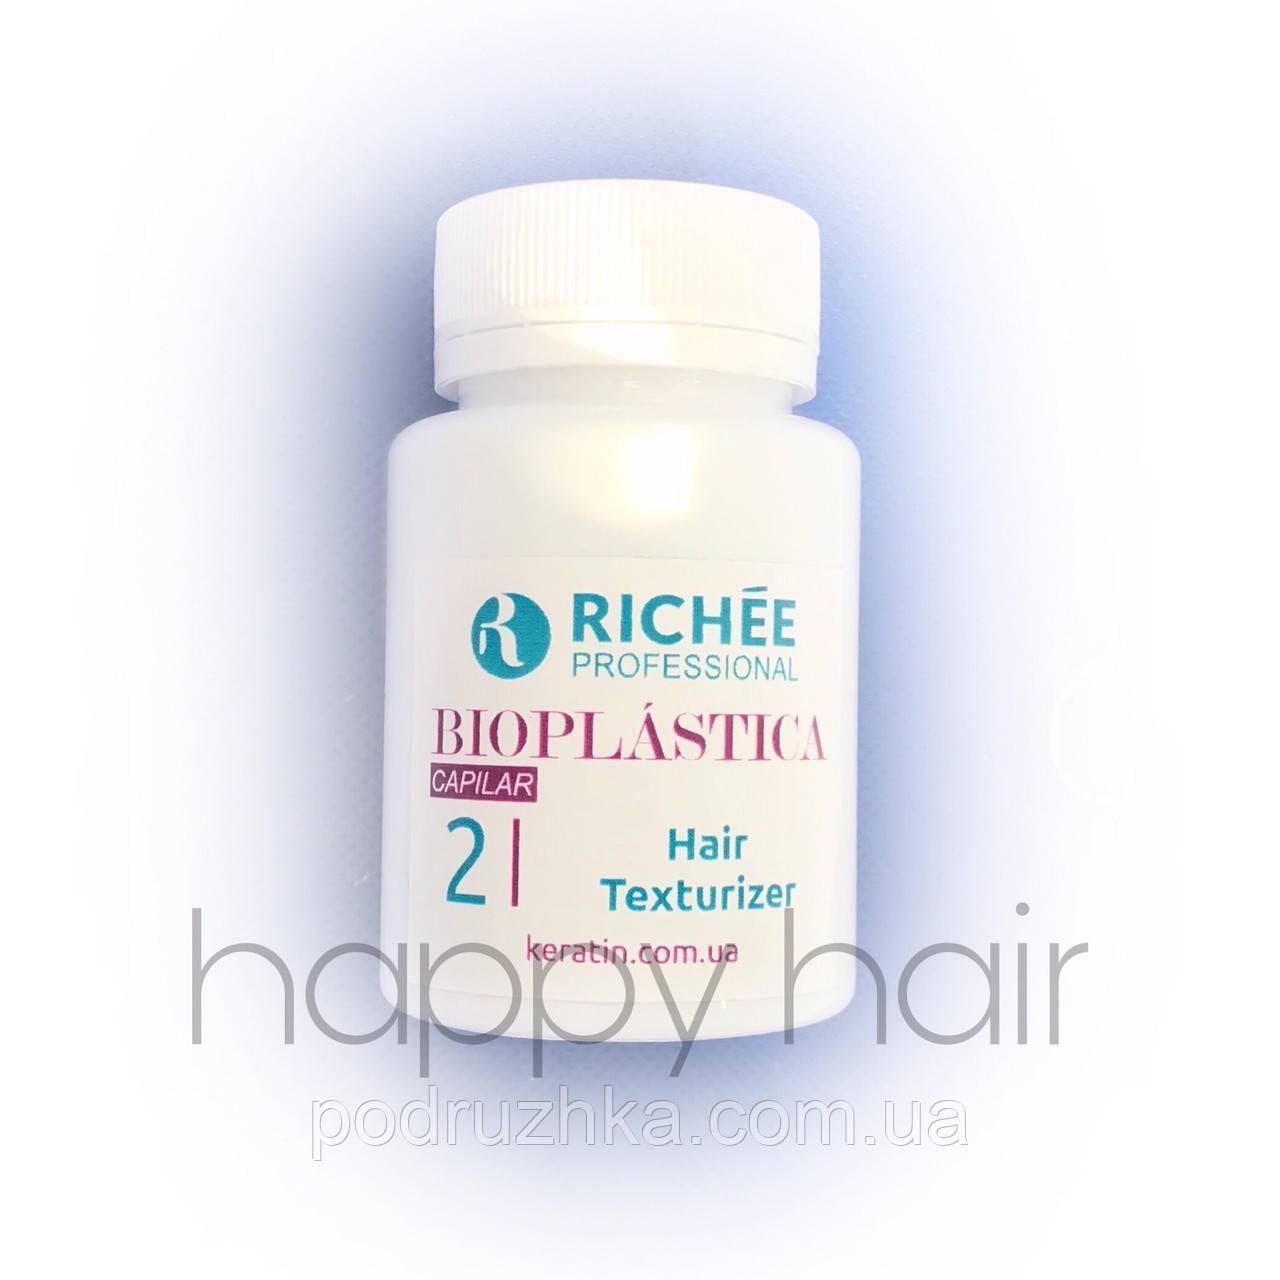 Richée Bioplástica Capilar Состав кератина для волос 200 мл